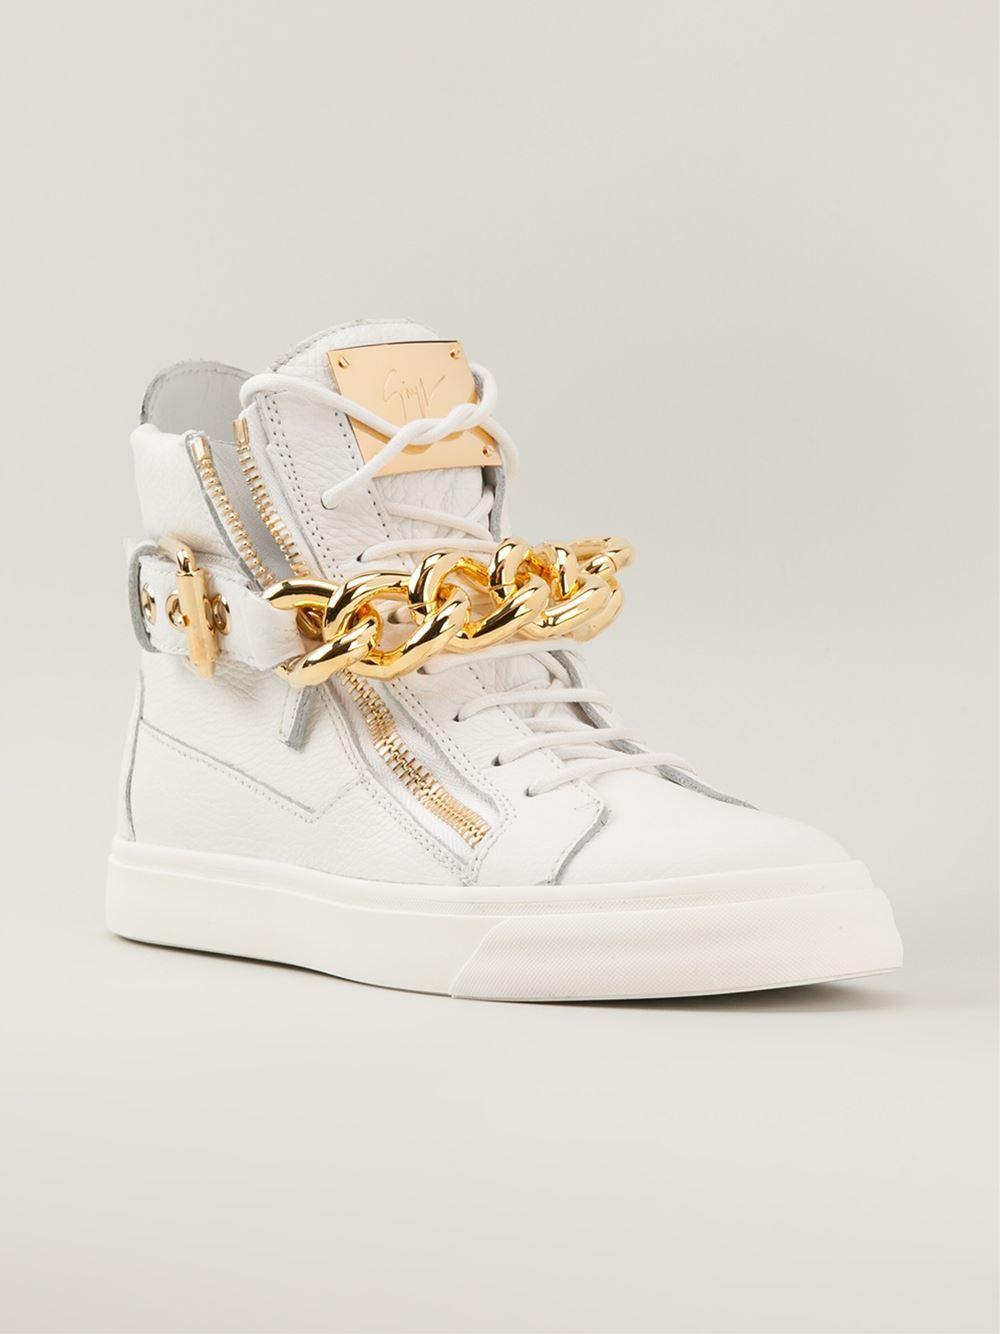 Giuseppe Zanotti White And Gold Shoes